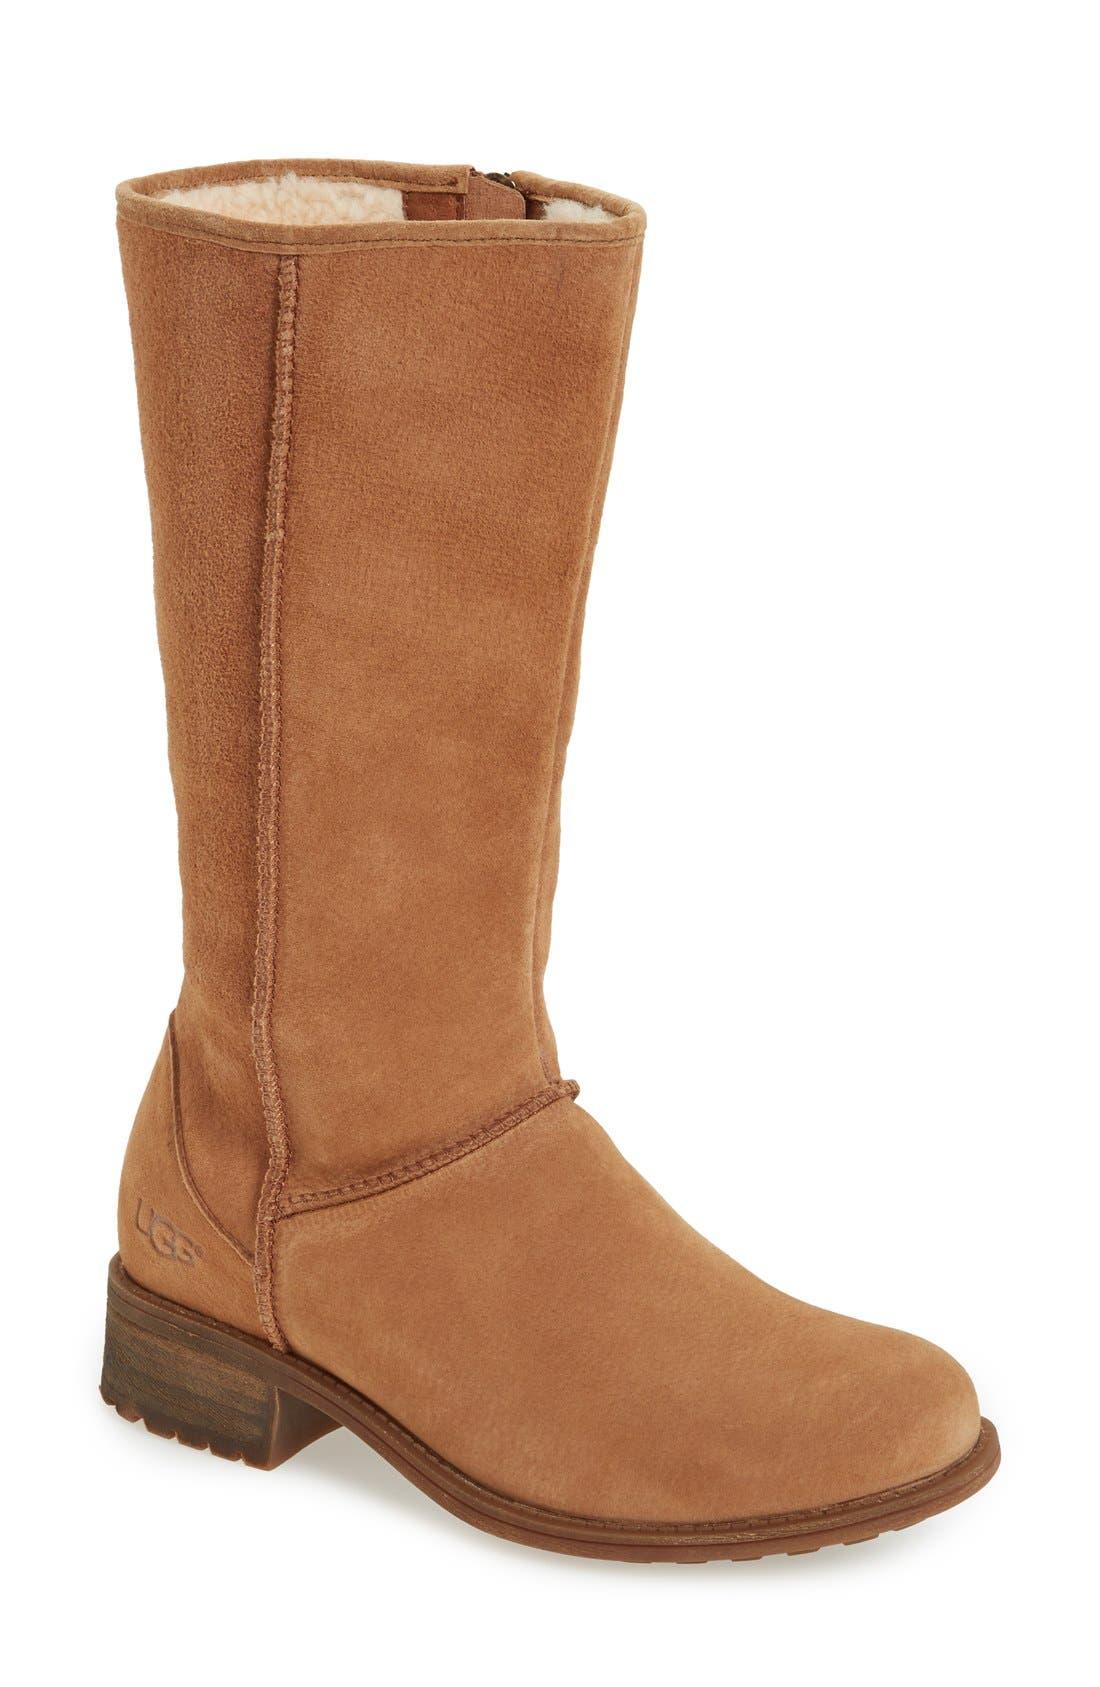 Main Image - UGG® Linford Boot (Women) (Wide Calf)